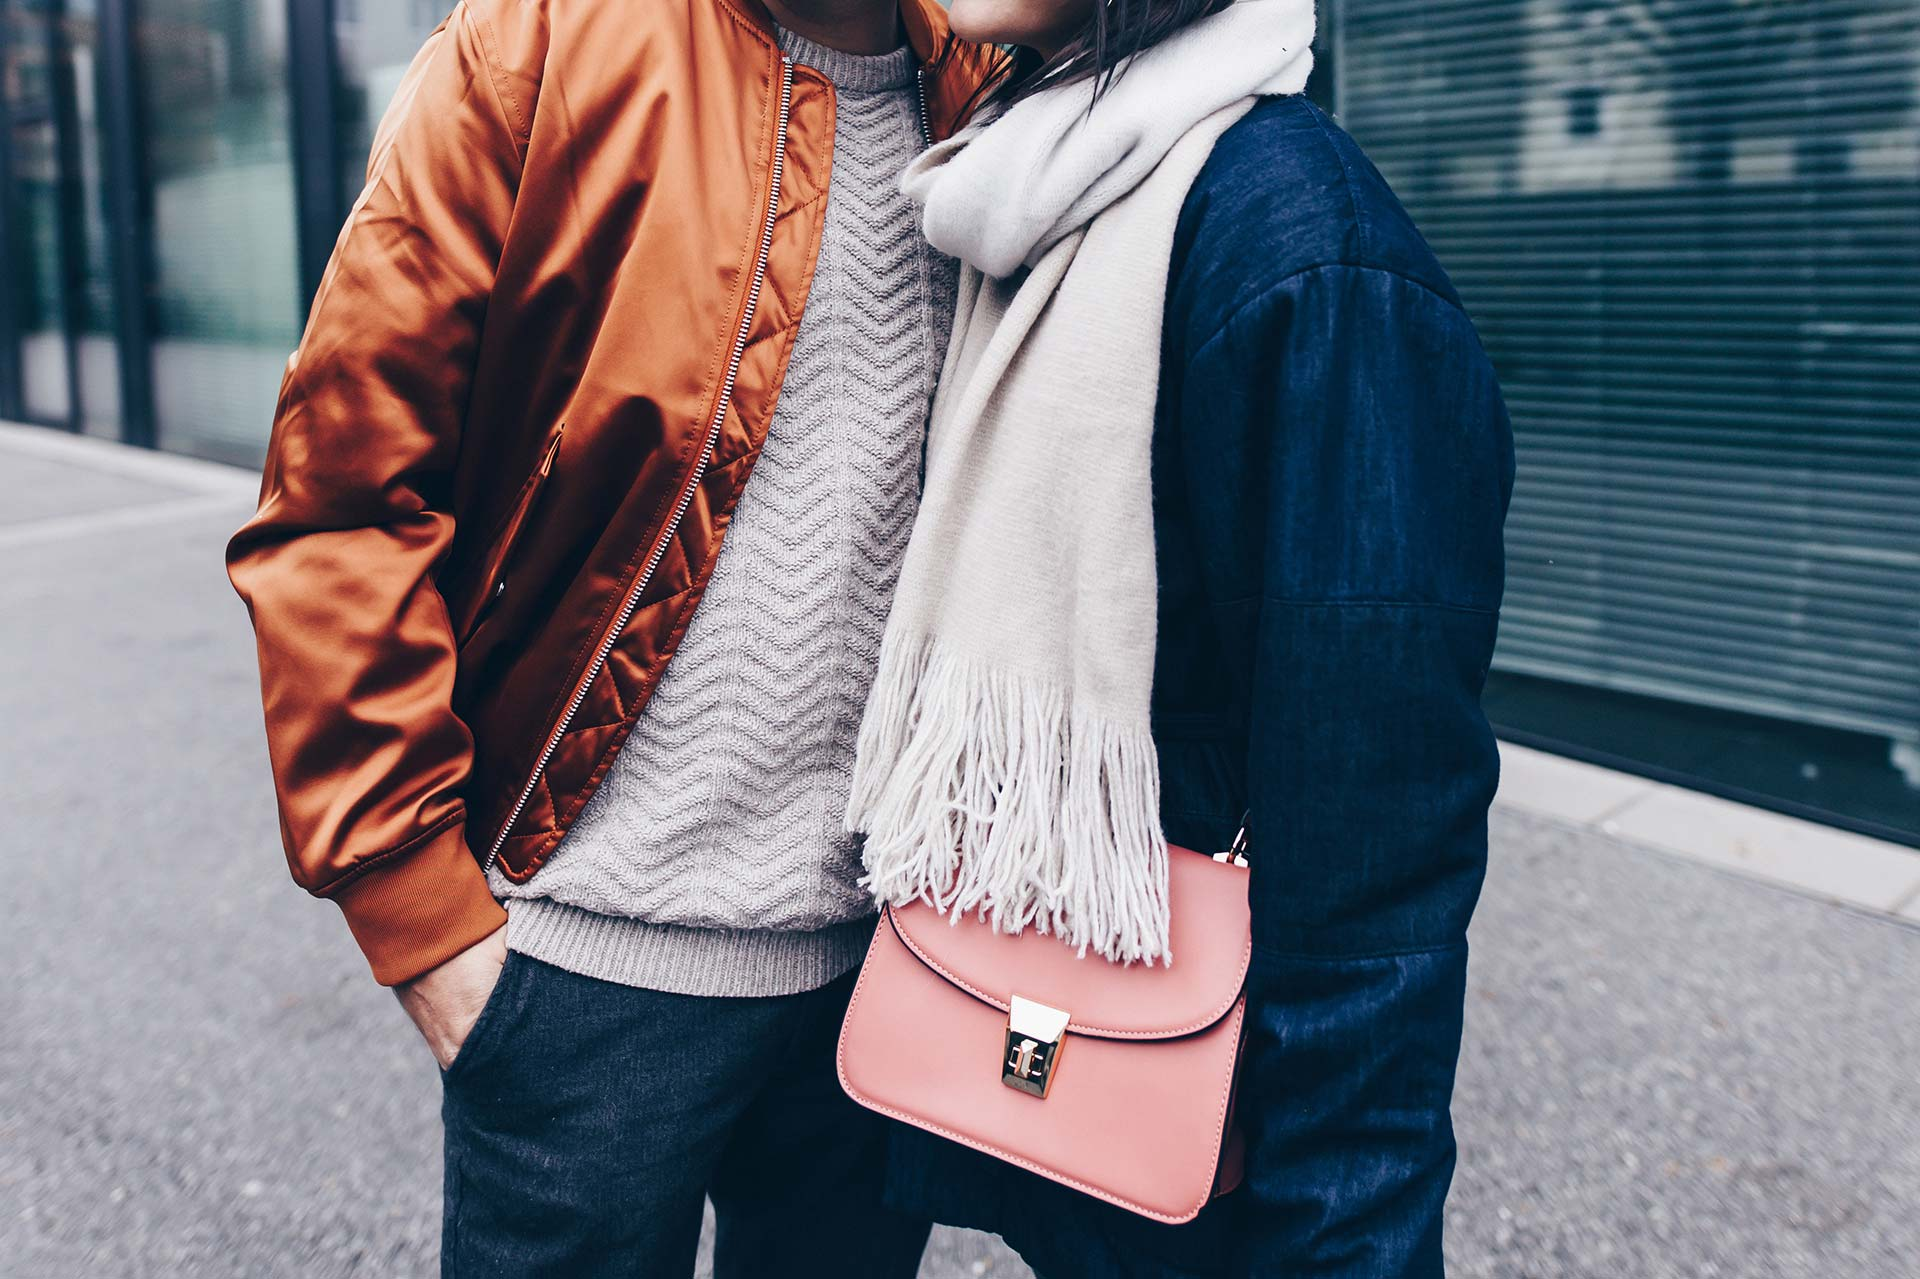 Basic Casual Paar Outfit, Partnerlook, Pärchen Outfit, Casual Chic Style für Damen und Herren, Sneaker Wedges, Bomberjacke, Jeans Outfit, Fashion Blog, Modeblog, Männer Blog, www.whoismocca.com